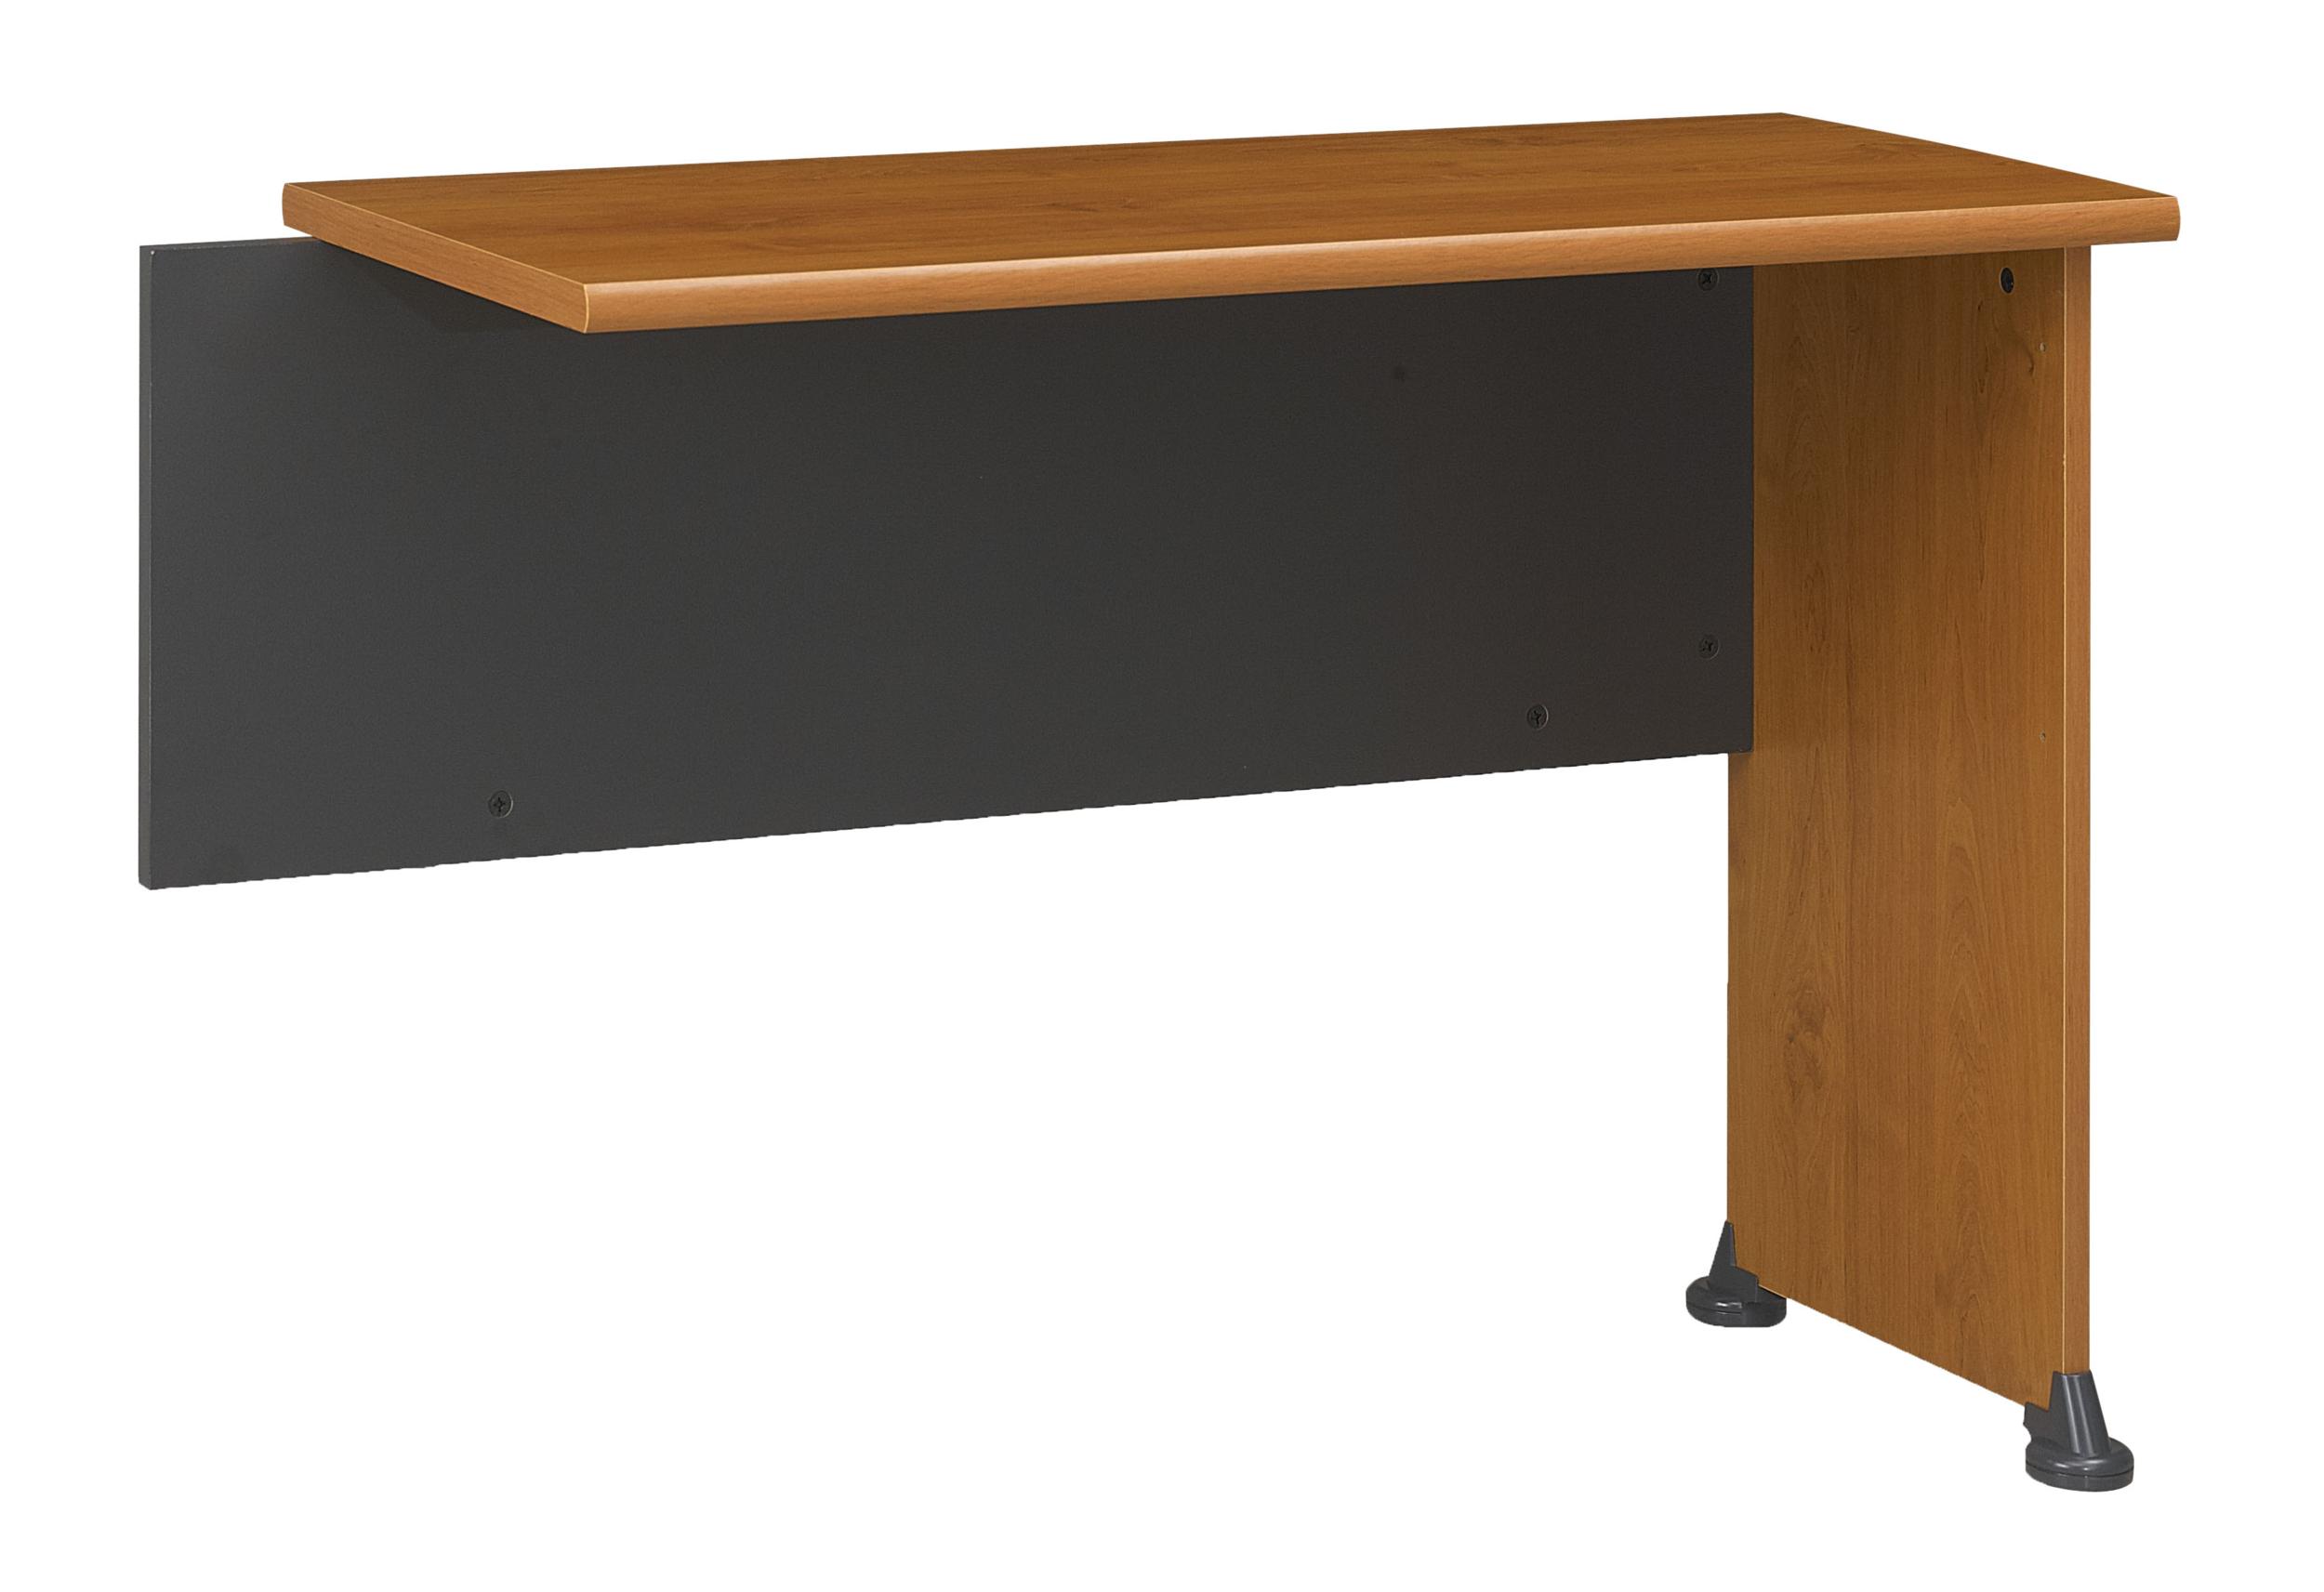 bureau gami amazing meuble with bureau gami affordable lit mezzanine best of lit mezzanine et. Black Bedroom Furniture Sets. Home Design Ideas